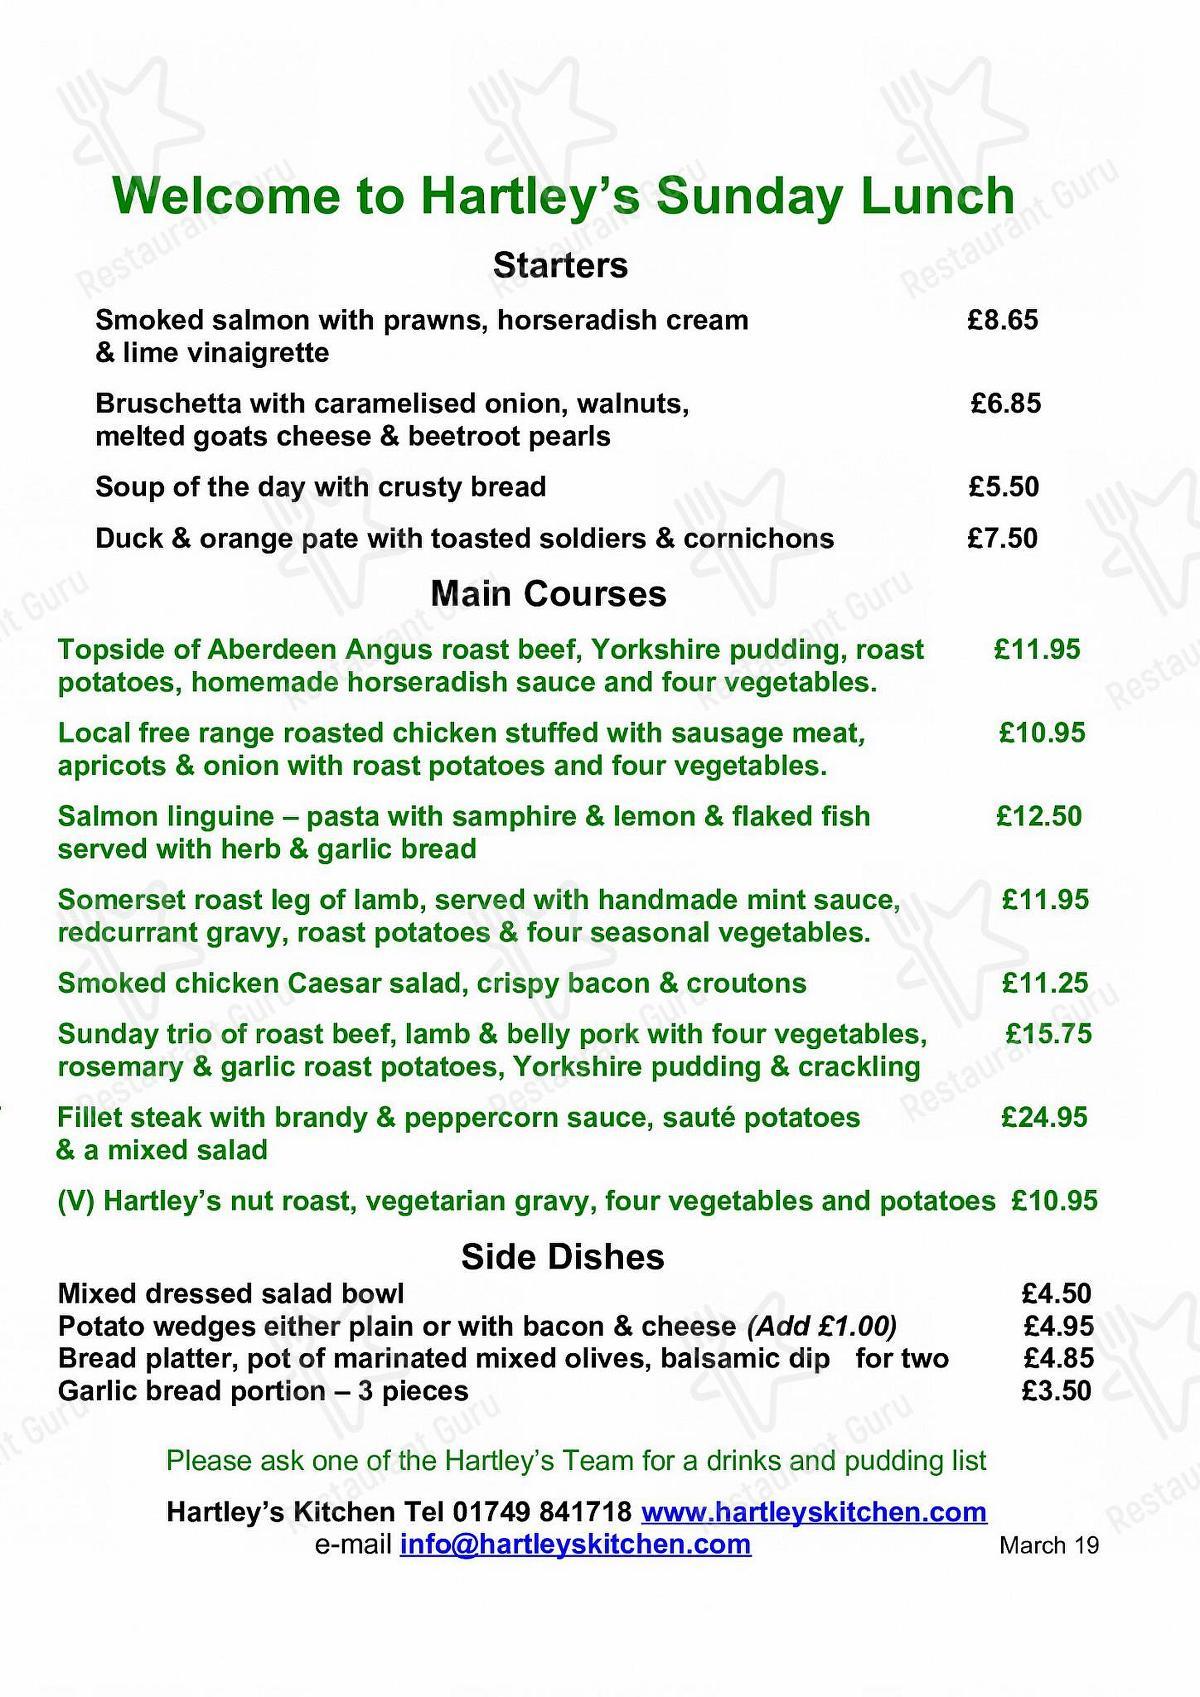 Hartleys Kitchen menu - dishes and beverages